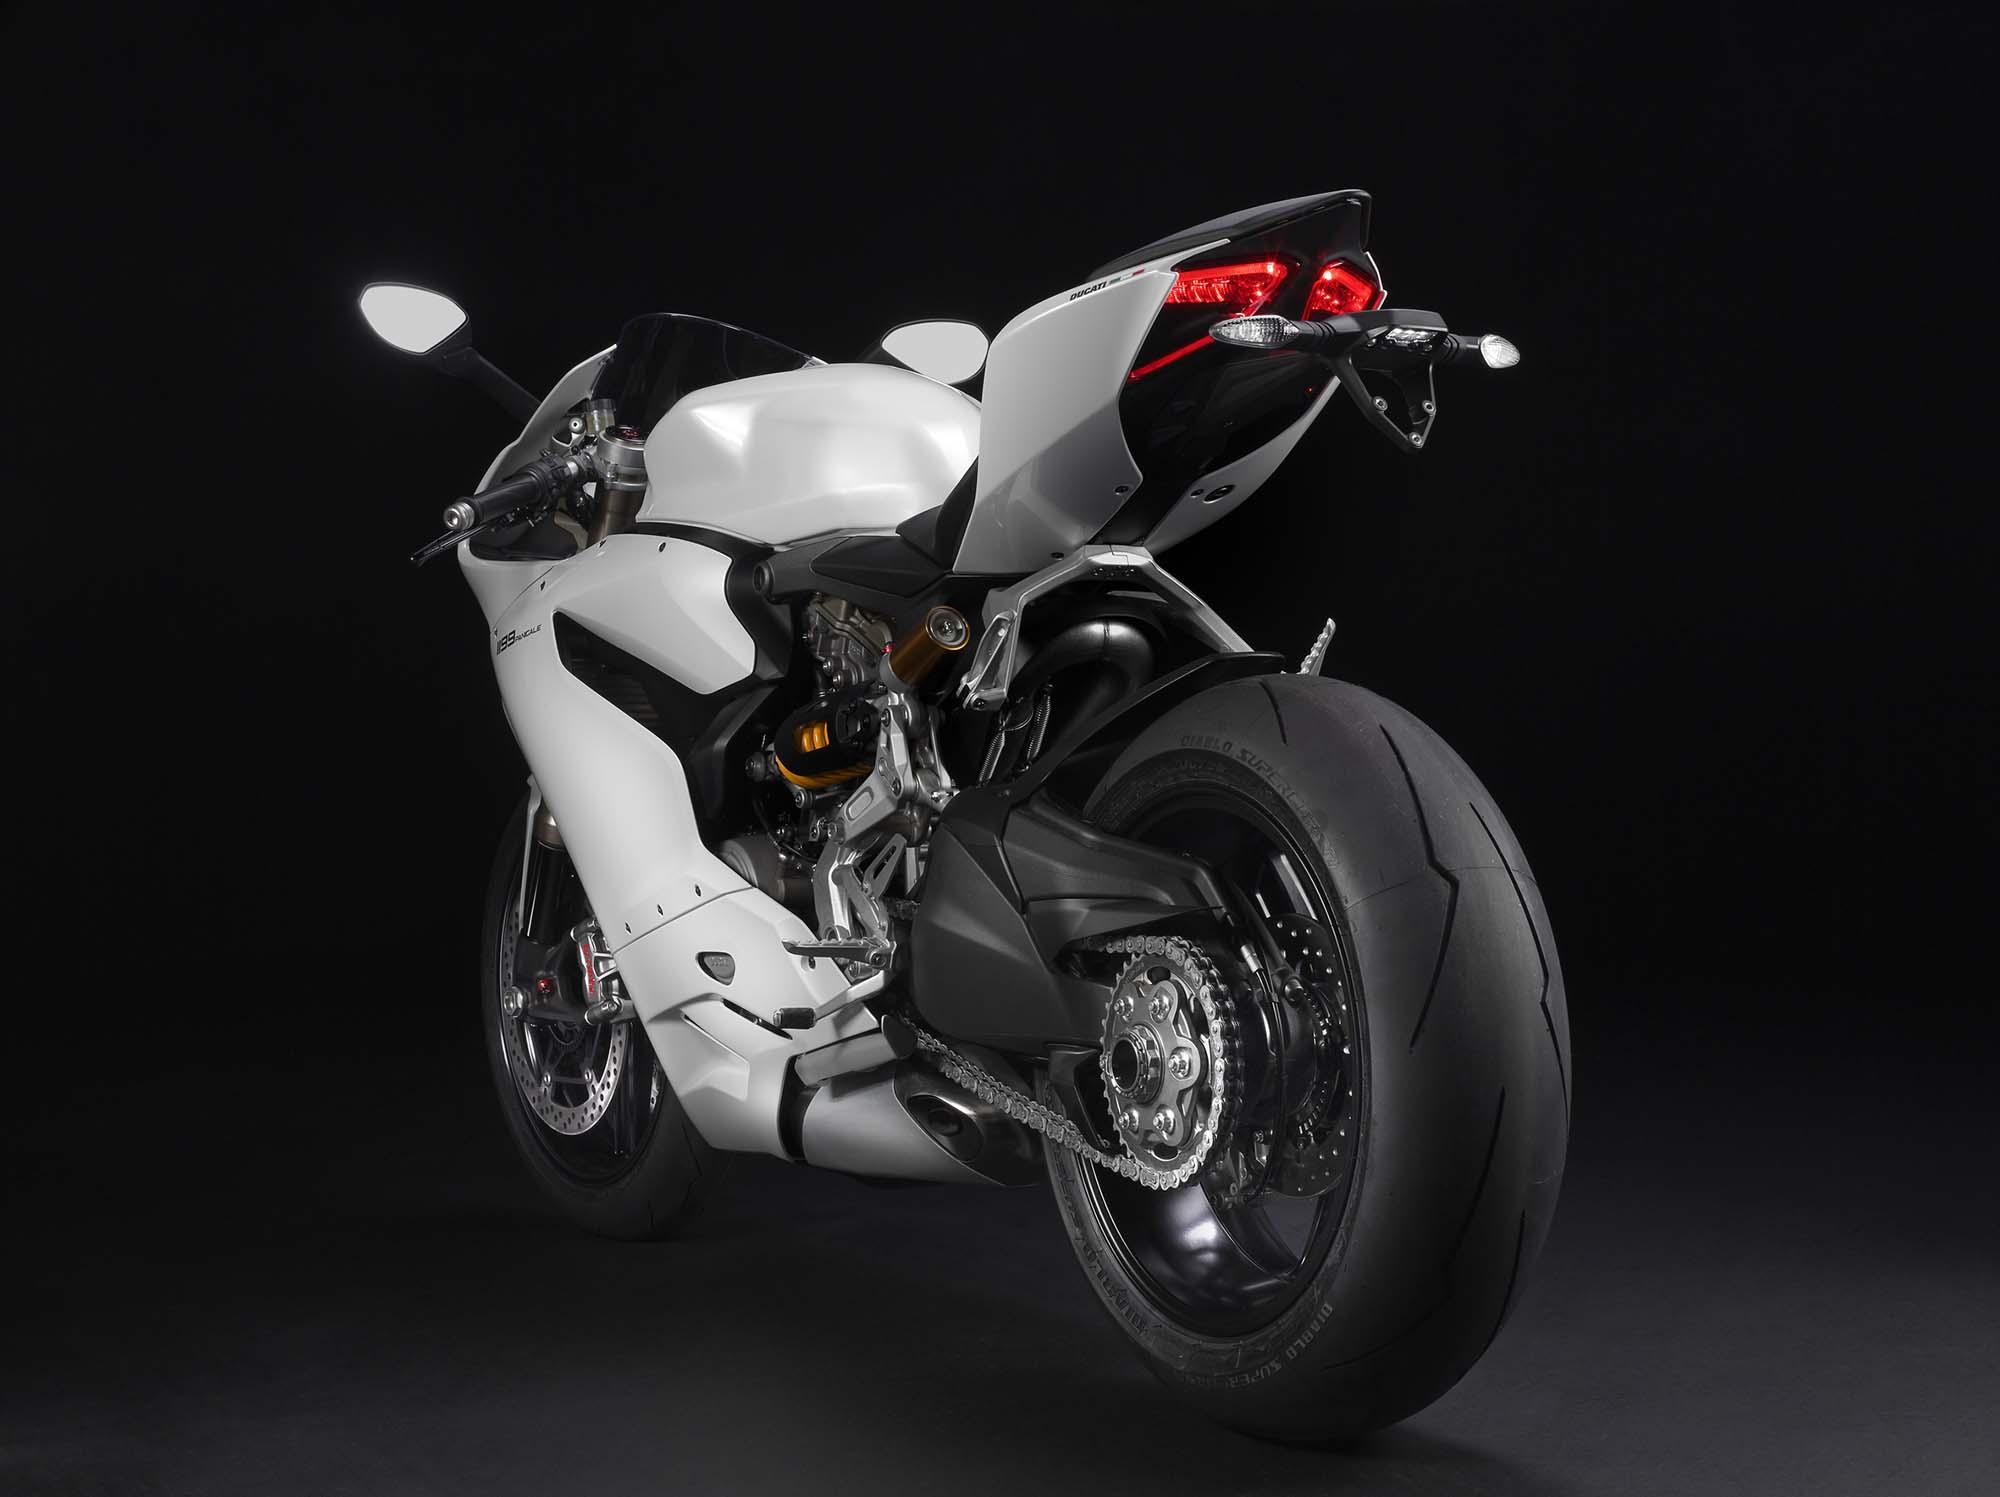 My Arctic White Ducati Monster